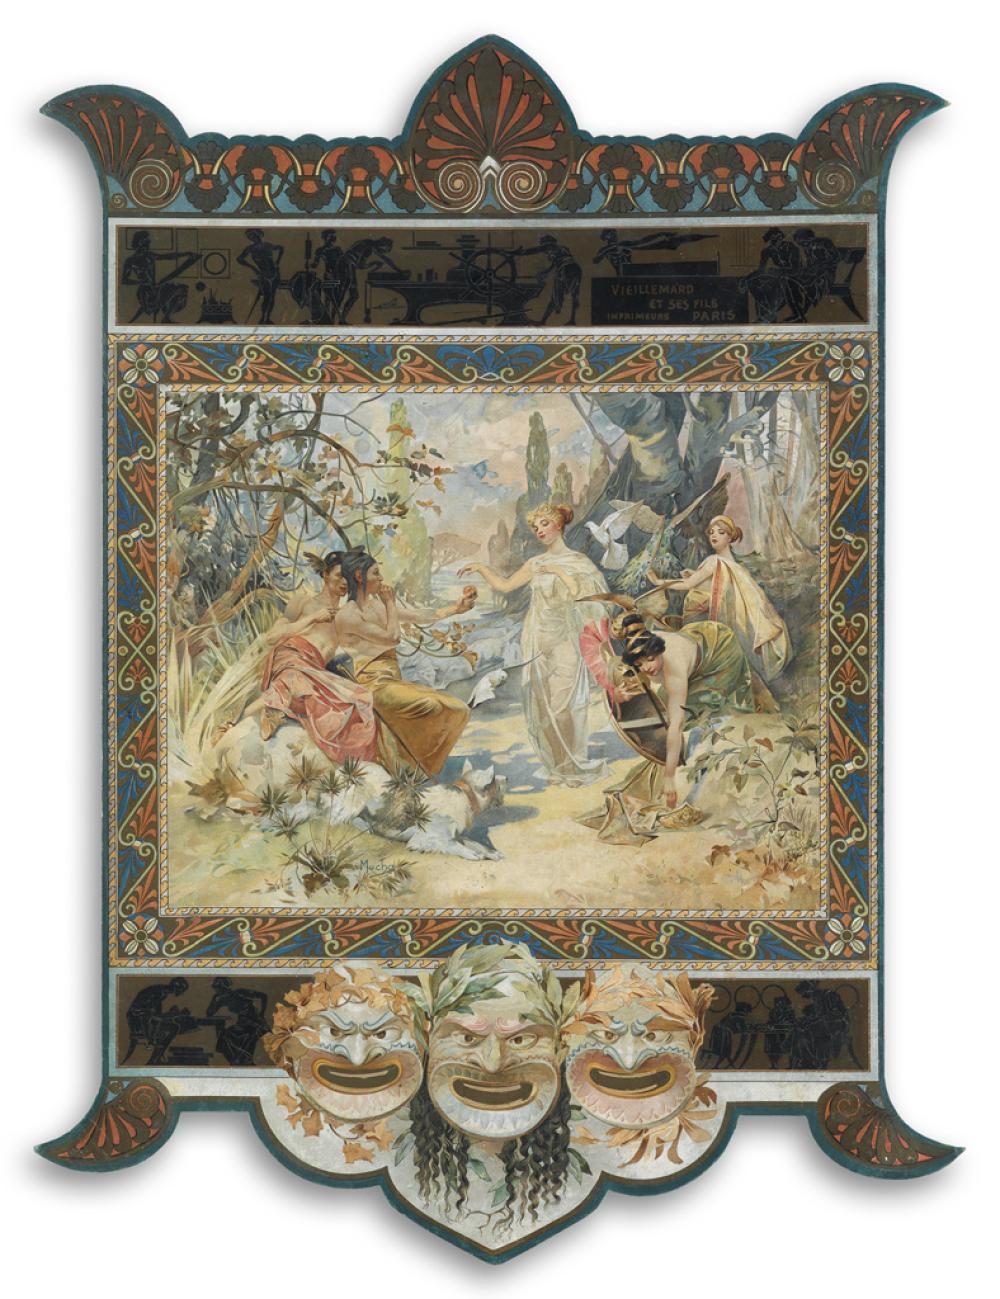 ALPHONSE MUCHA (1860-1939). [JUDGEMENT OF PARIS.] Calendar holder. 1895. 24x18 inches, 61x46 cm. [Vieillemard & Ses Filles, Paris.]